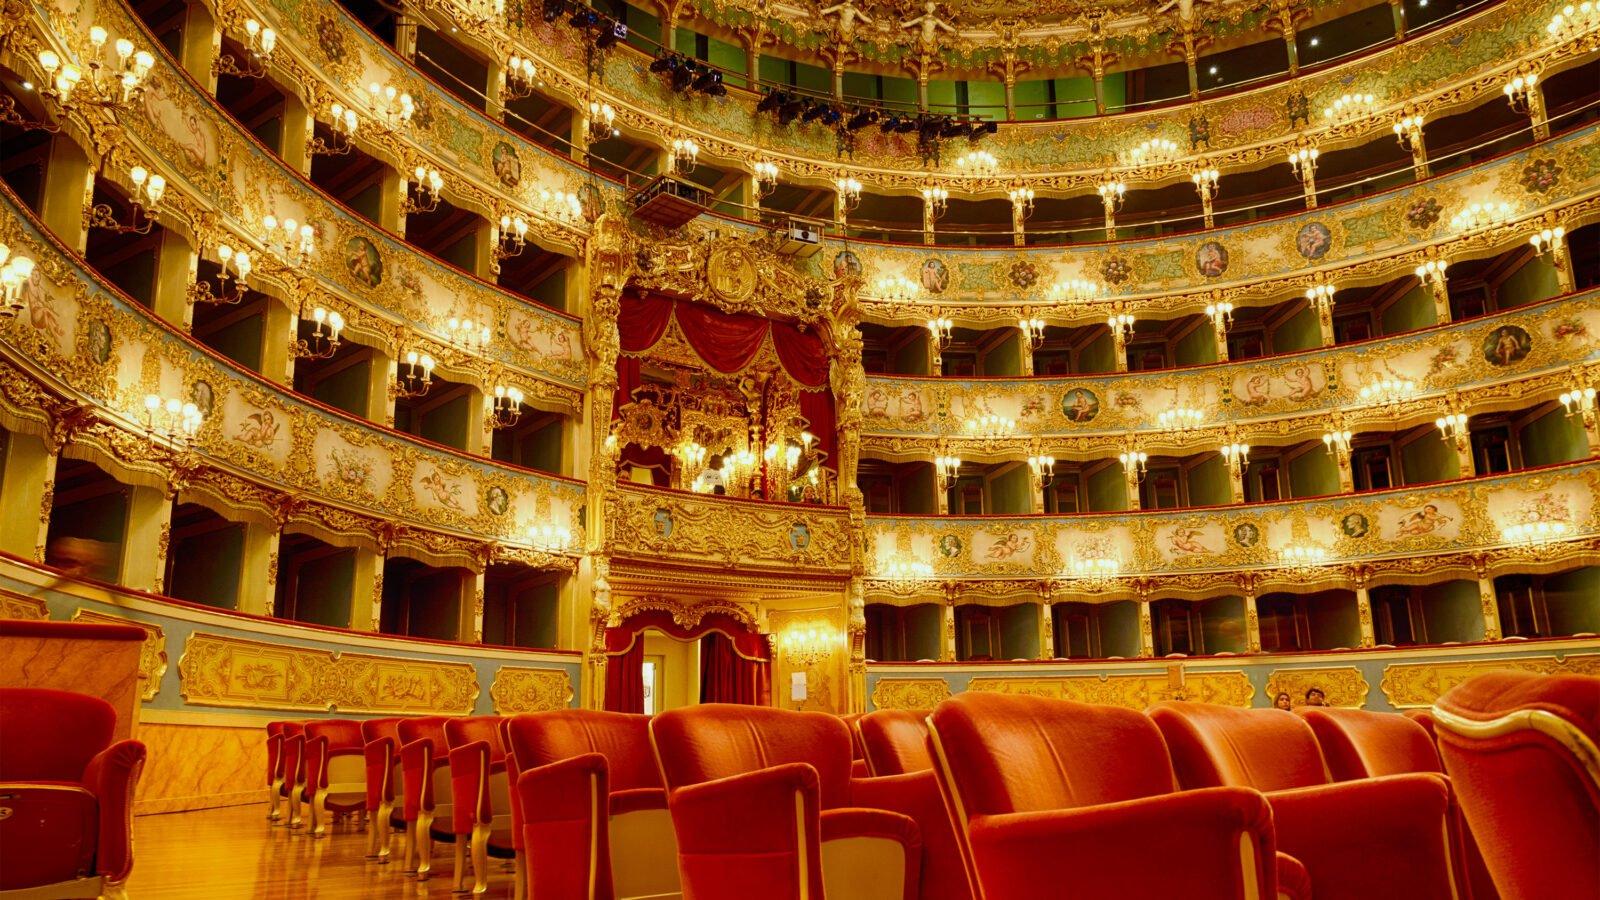 Teatro La Fenice in Venice (Photo: Miguel Mendez)